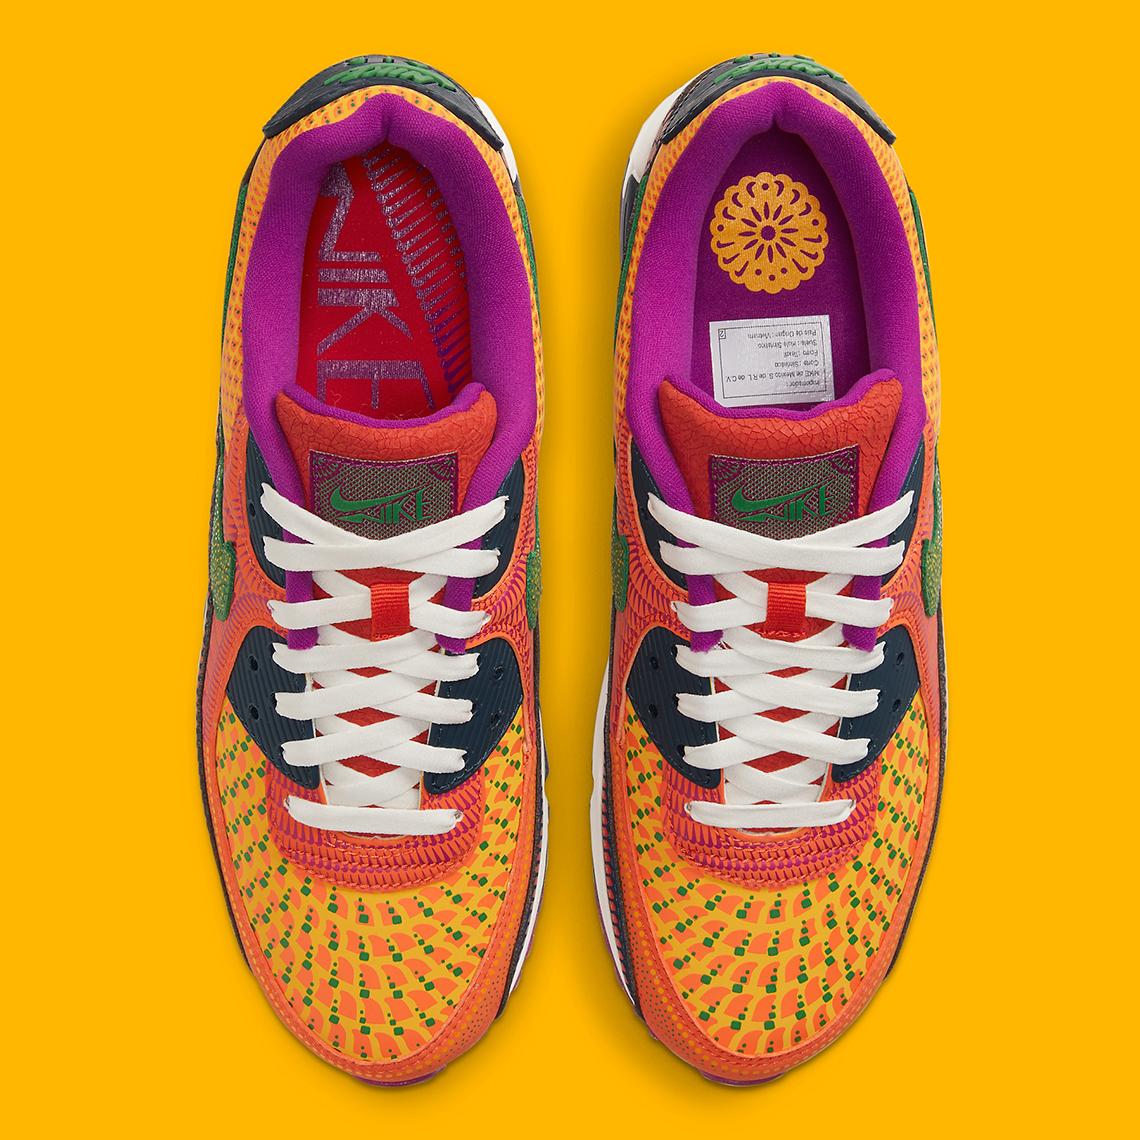 Nike Air Max 90 Dia de Los Muertos DC5154-458   SneakerNews.com